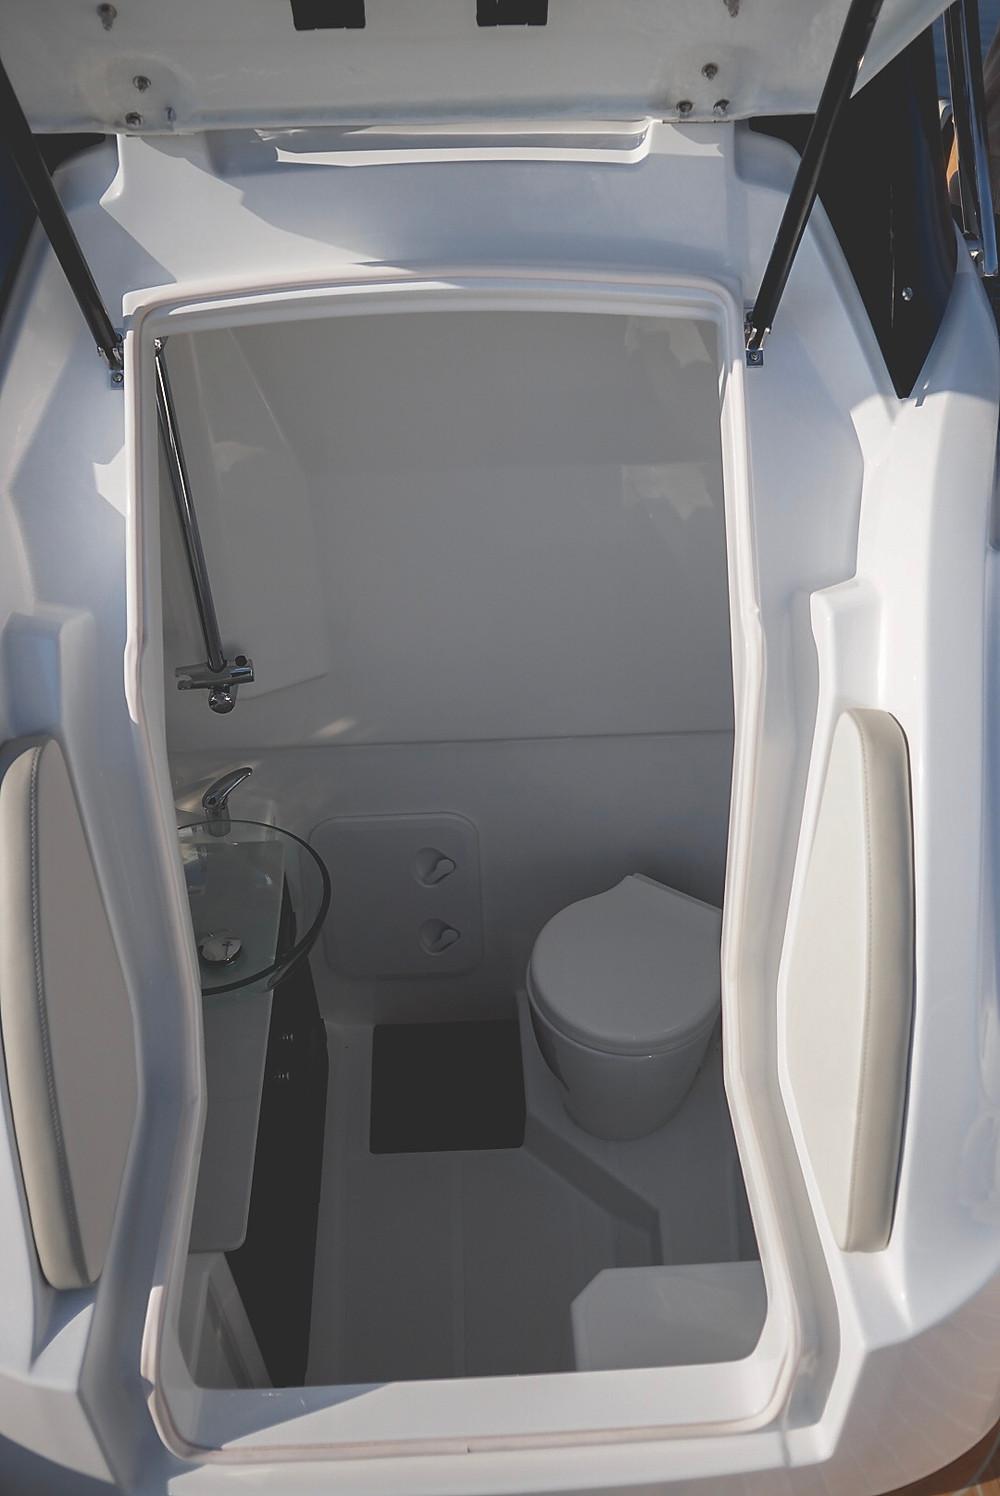 toilette rigid inflatable boat